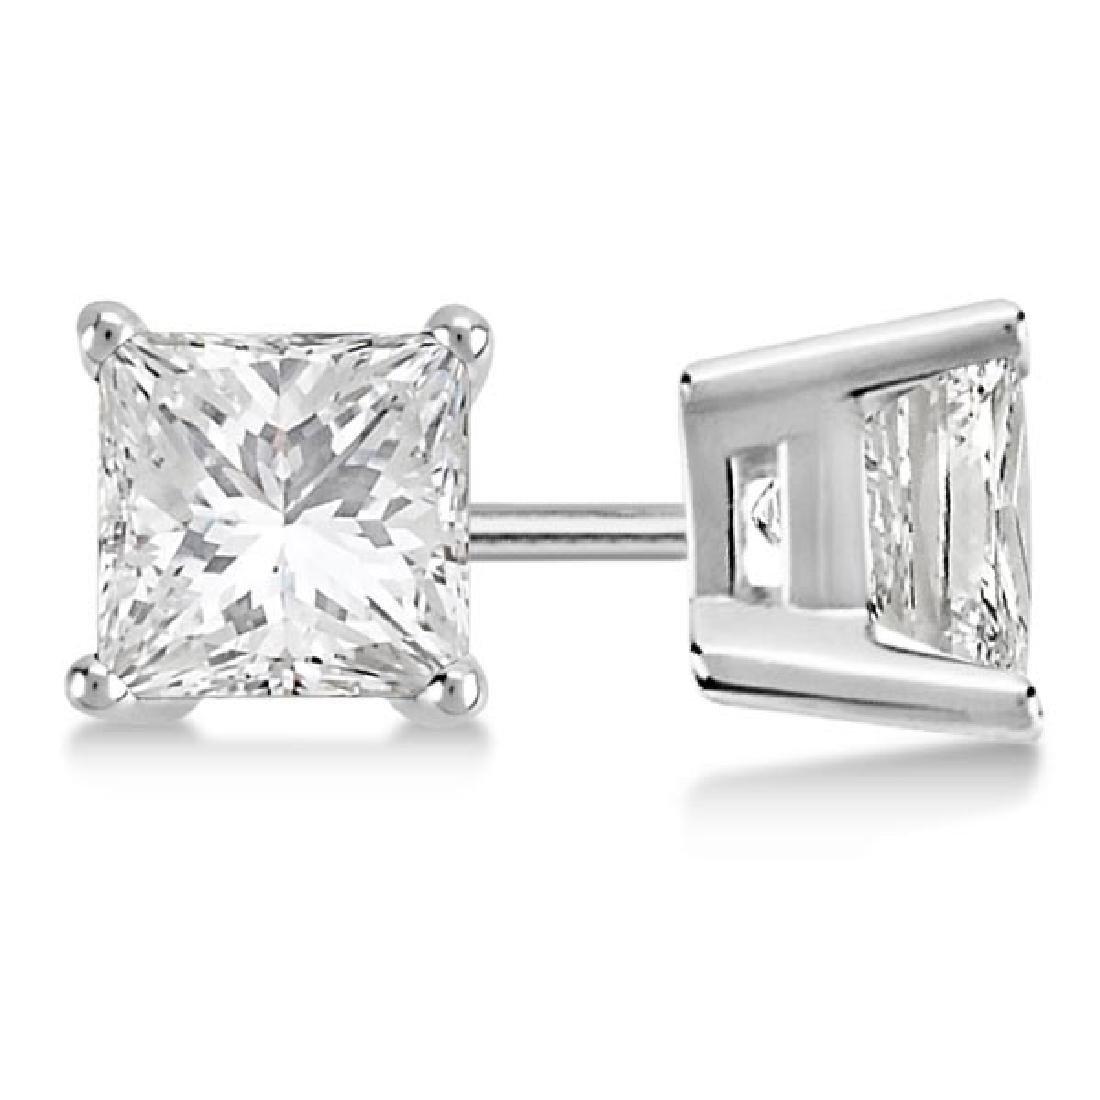 Certified 1.02 CTW Princess Diamond Stud Earrings F/SI2